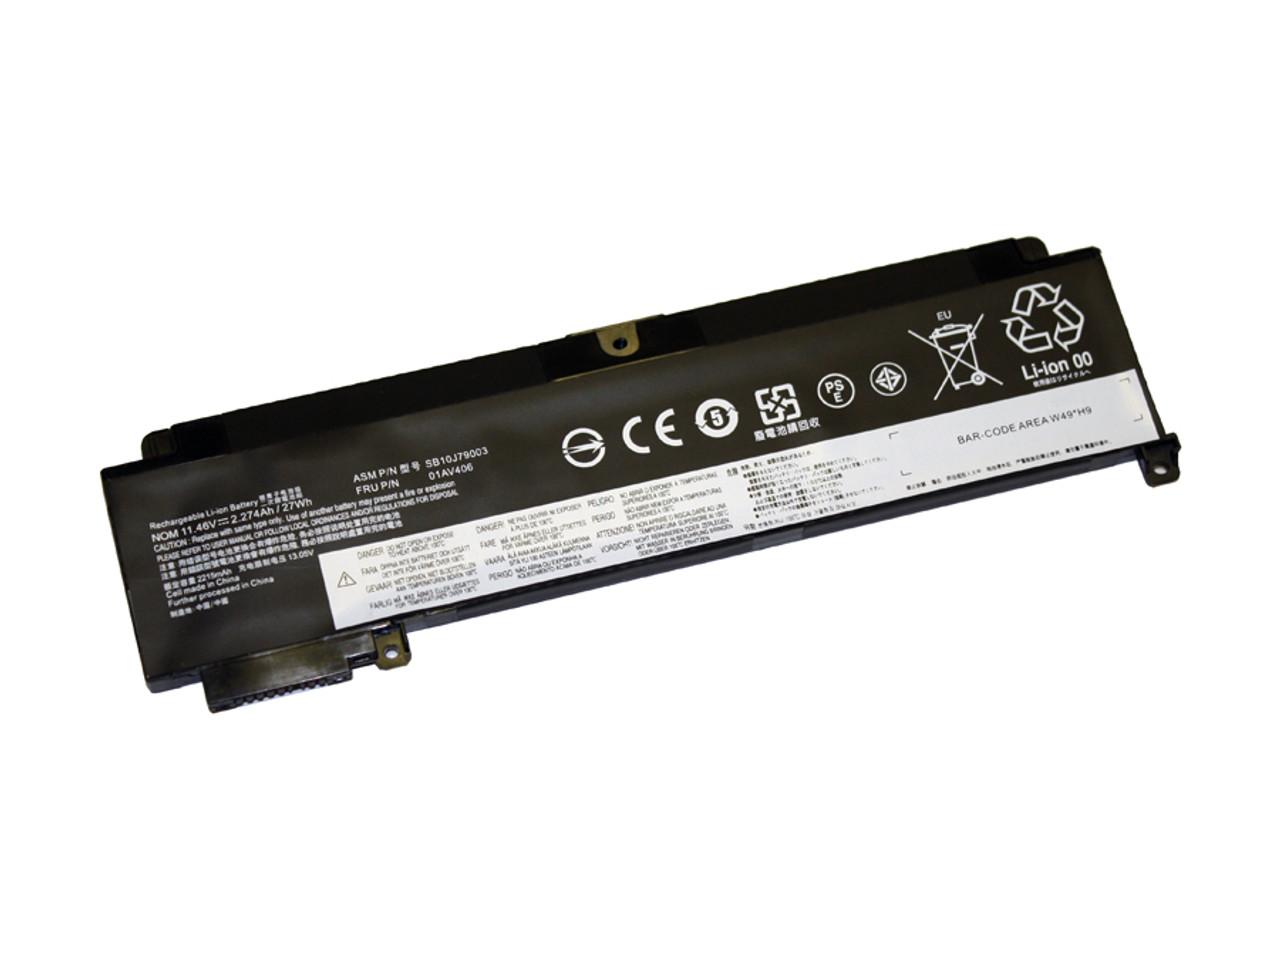 Laptop Battery for Lenovo Thinkpad T460s, T470s(3 cell, 2270 mAh)